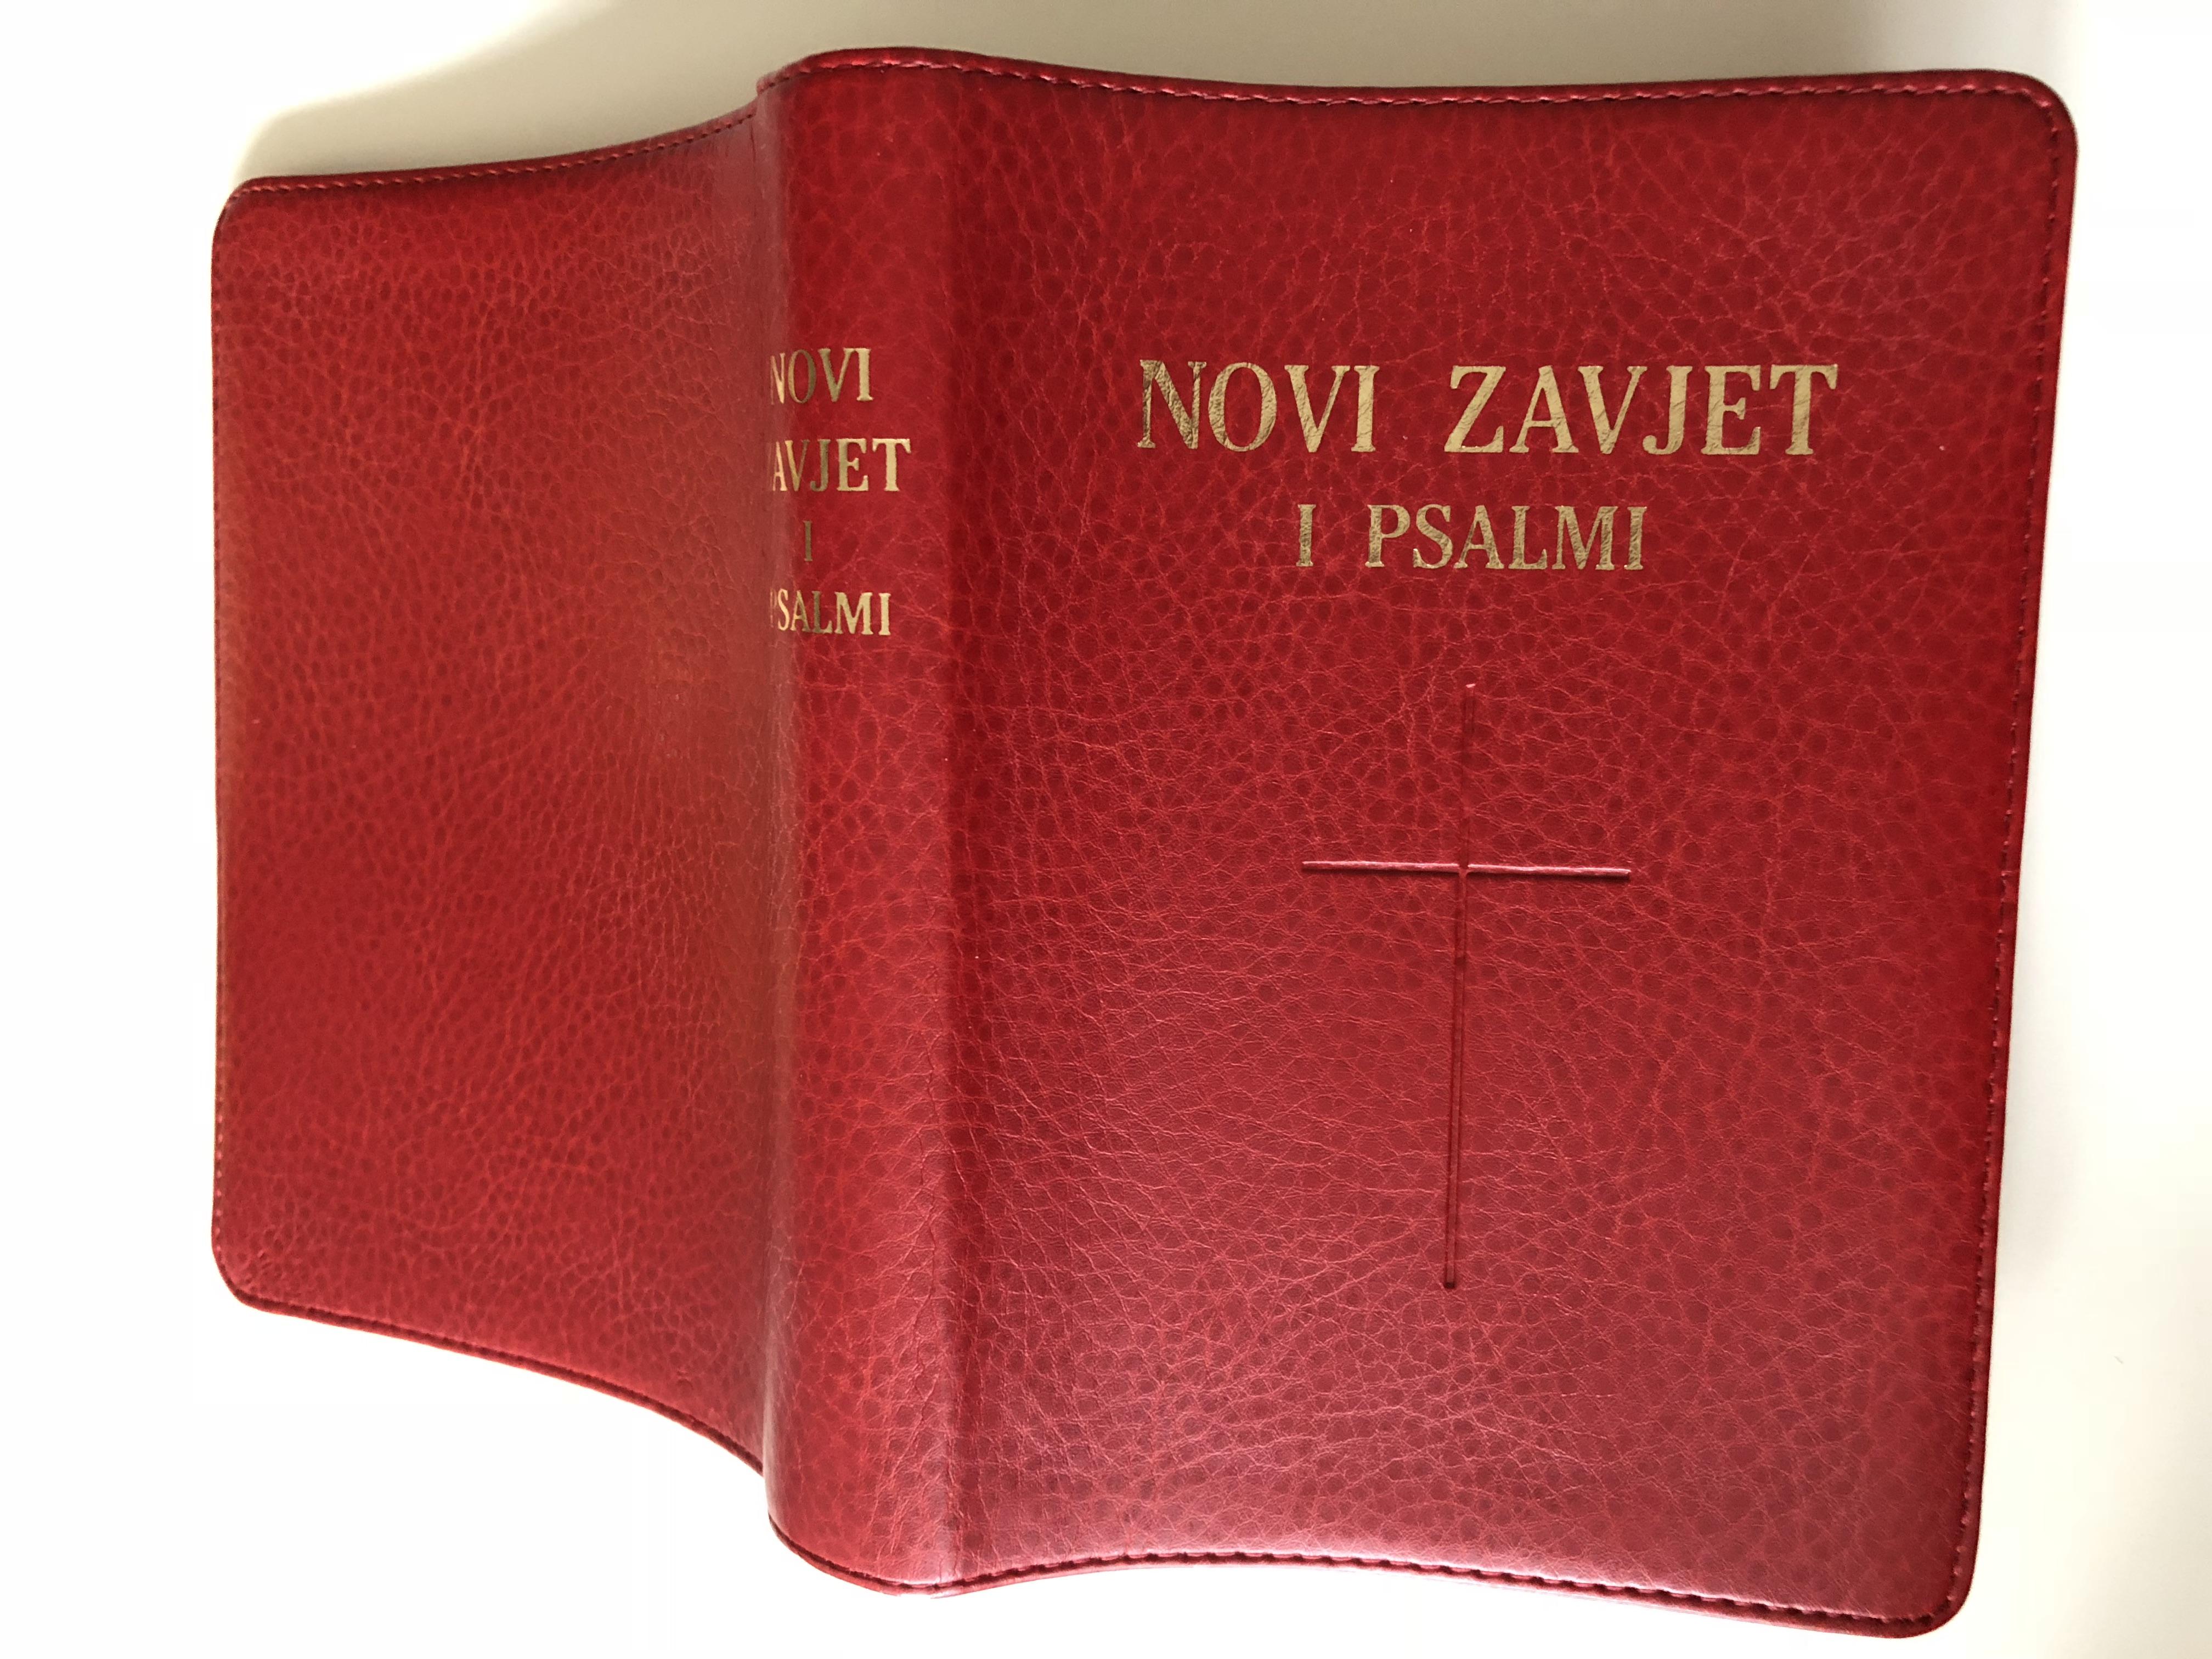 -novi-zavjet-i-psalmi-the-new-testament-and-the-book-of-psalms-in-croatian-language-red-leather-bound-16-.jpg